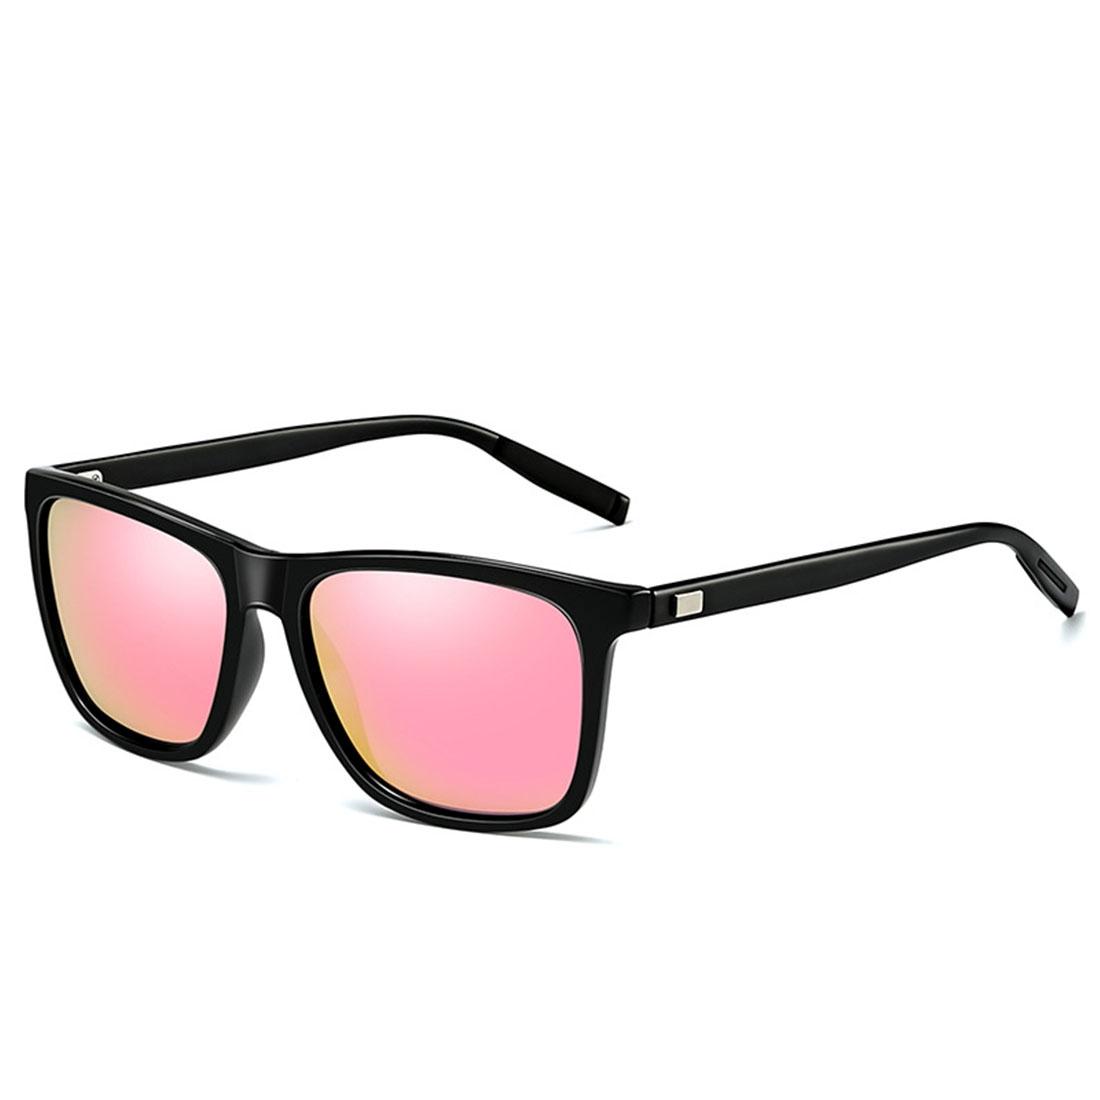 Men Retro Fashion Aluminum Magnesium Frame UV400 Polarized Sunglasses (Black Tarnish+ Grey)